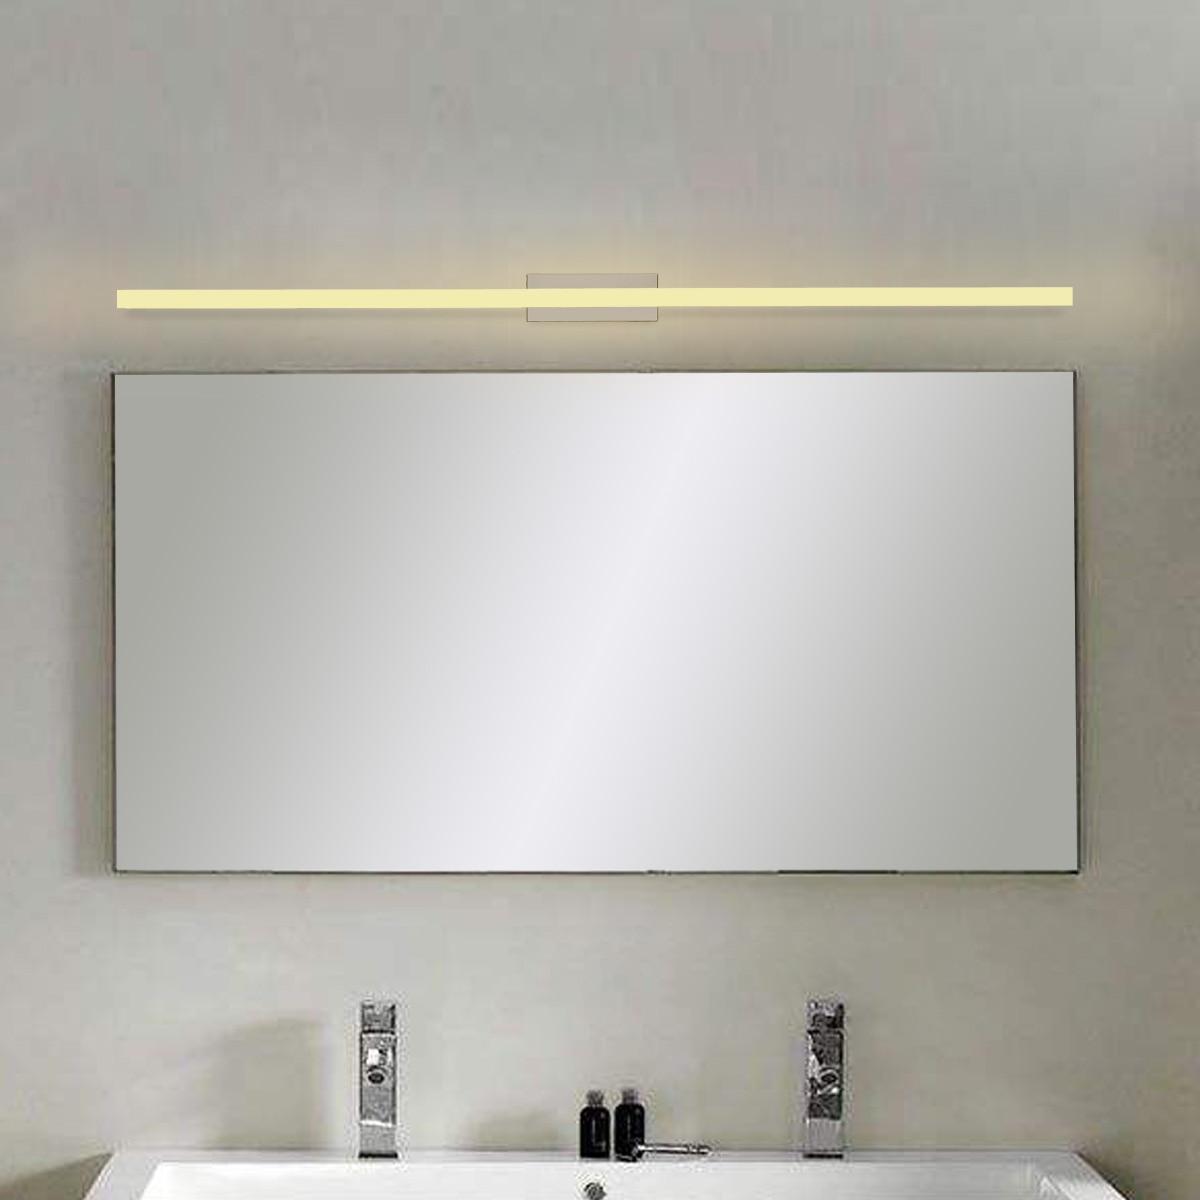 100% QualitäT Super Helle 1120lm 80 Cm 14 W 72 Led Spiegel Front Lampe Morden Bad Wc Eitelkeit Wand Make-up Licht Wand Lampe Ac85-265v